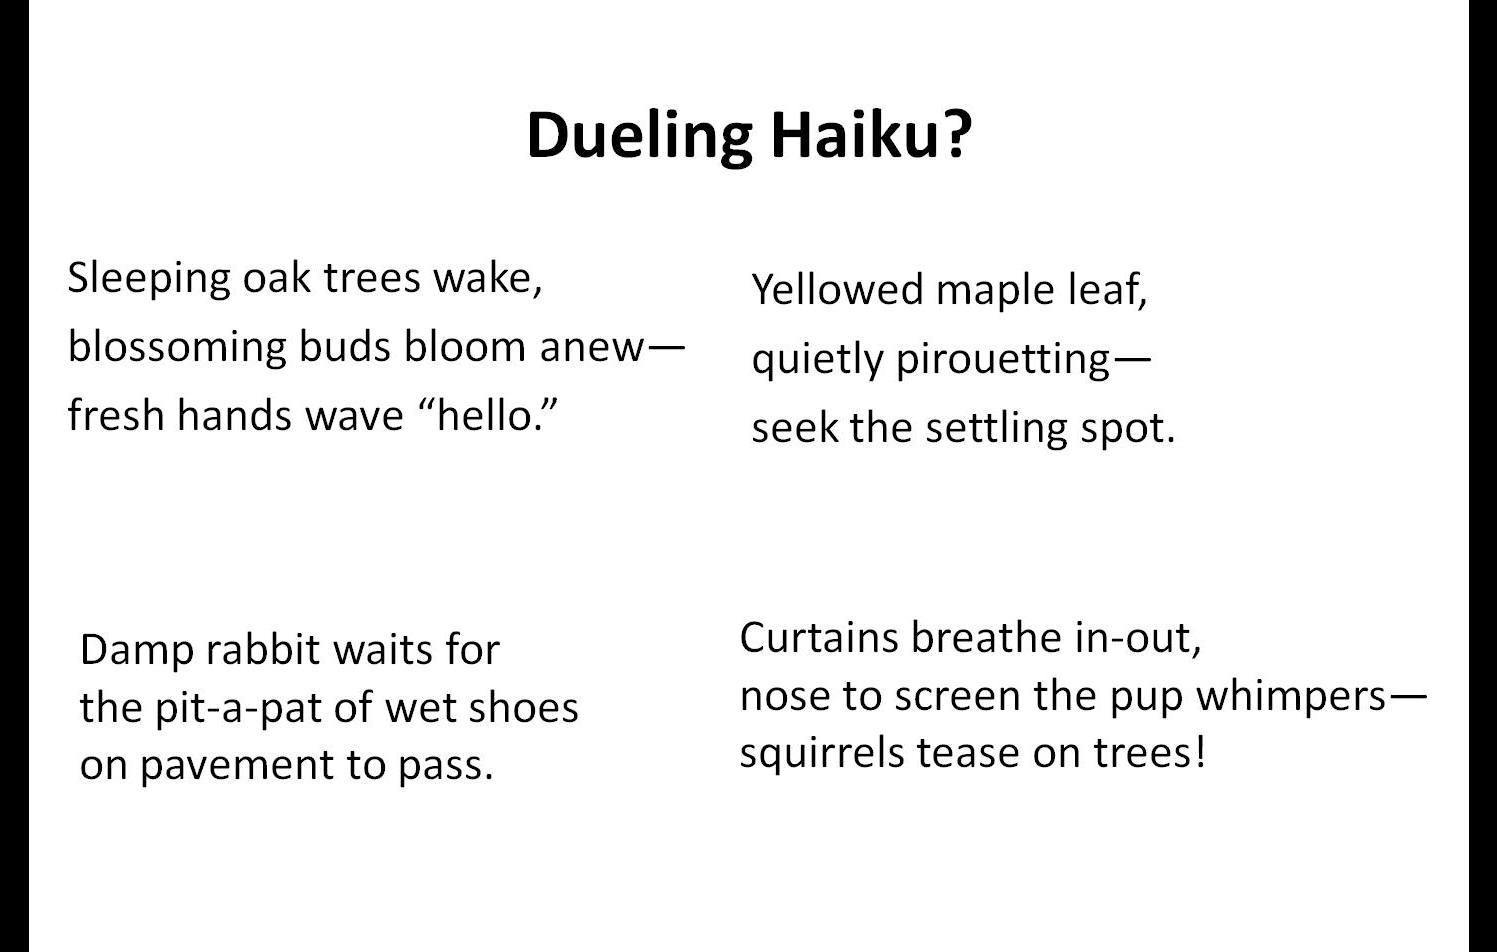 haiku examples - alisen berde